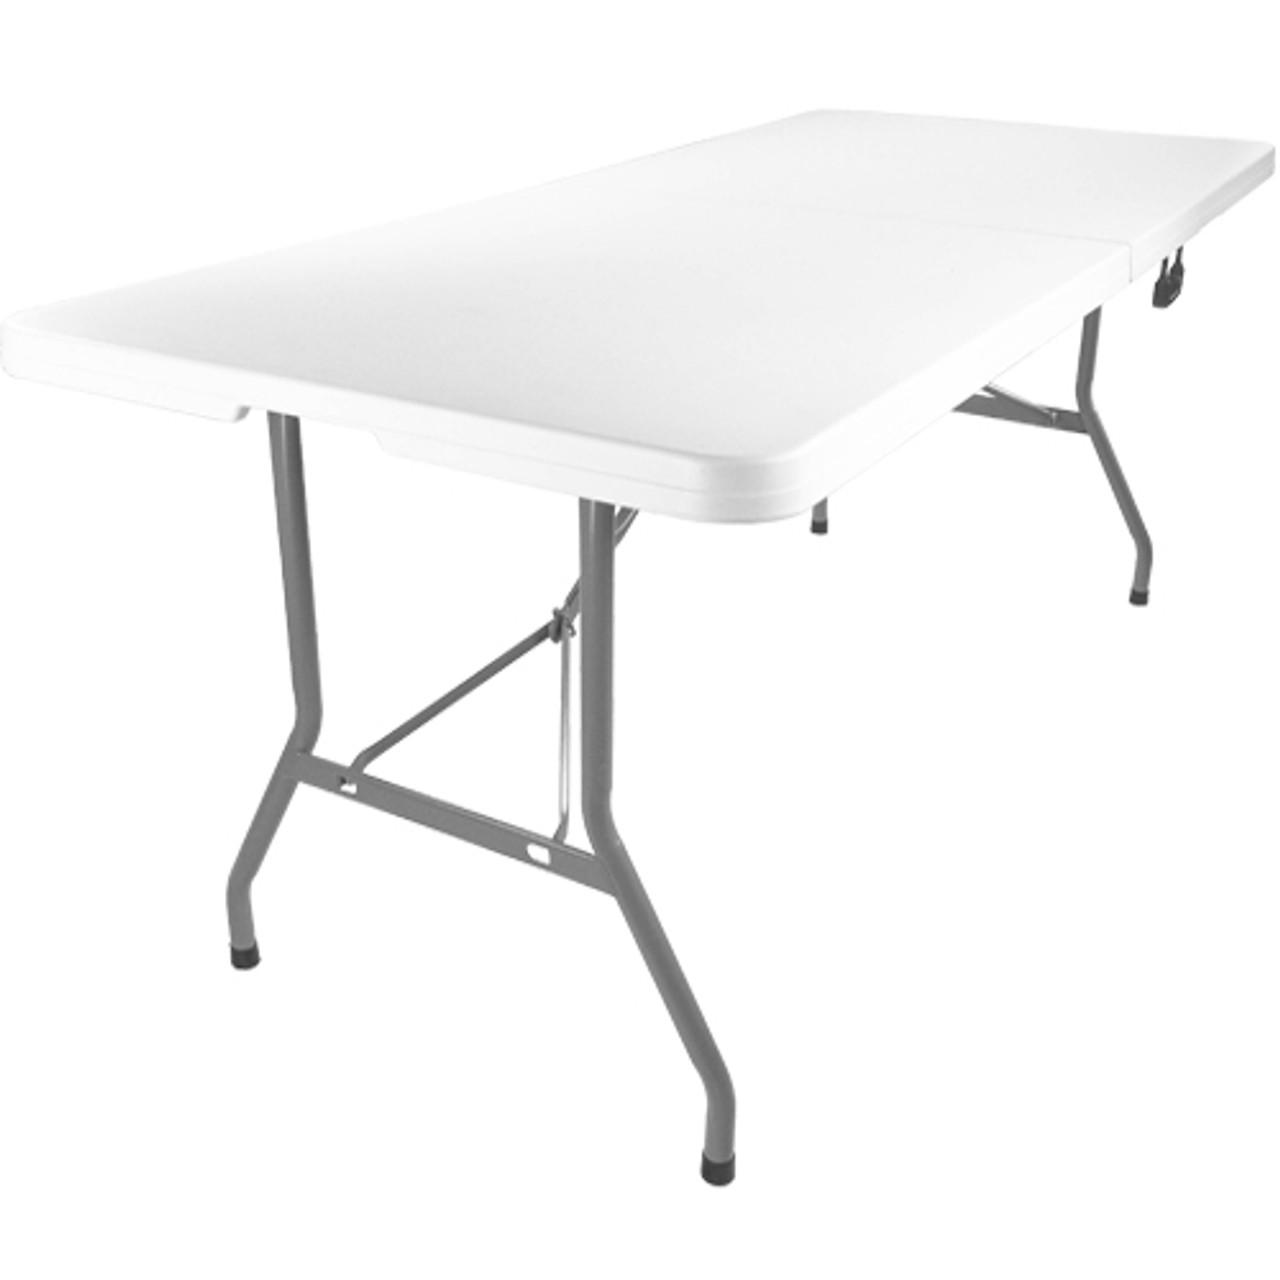 - 6 Ft Bifold Plastic Folding Table [ADV-3072LZ-BIFOLD